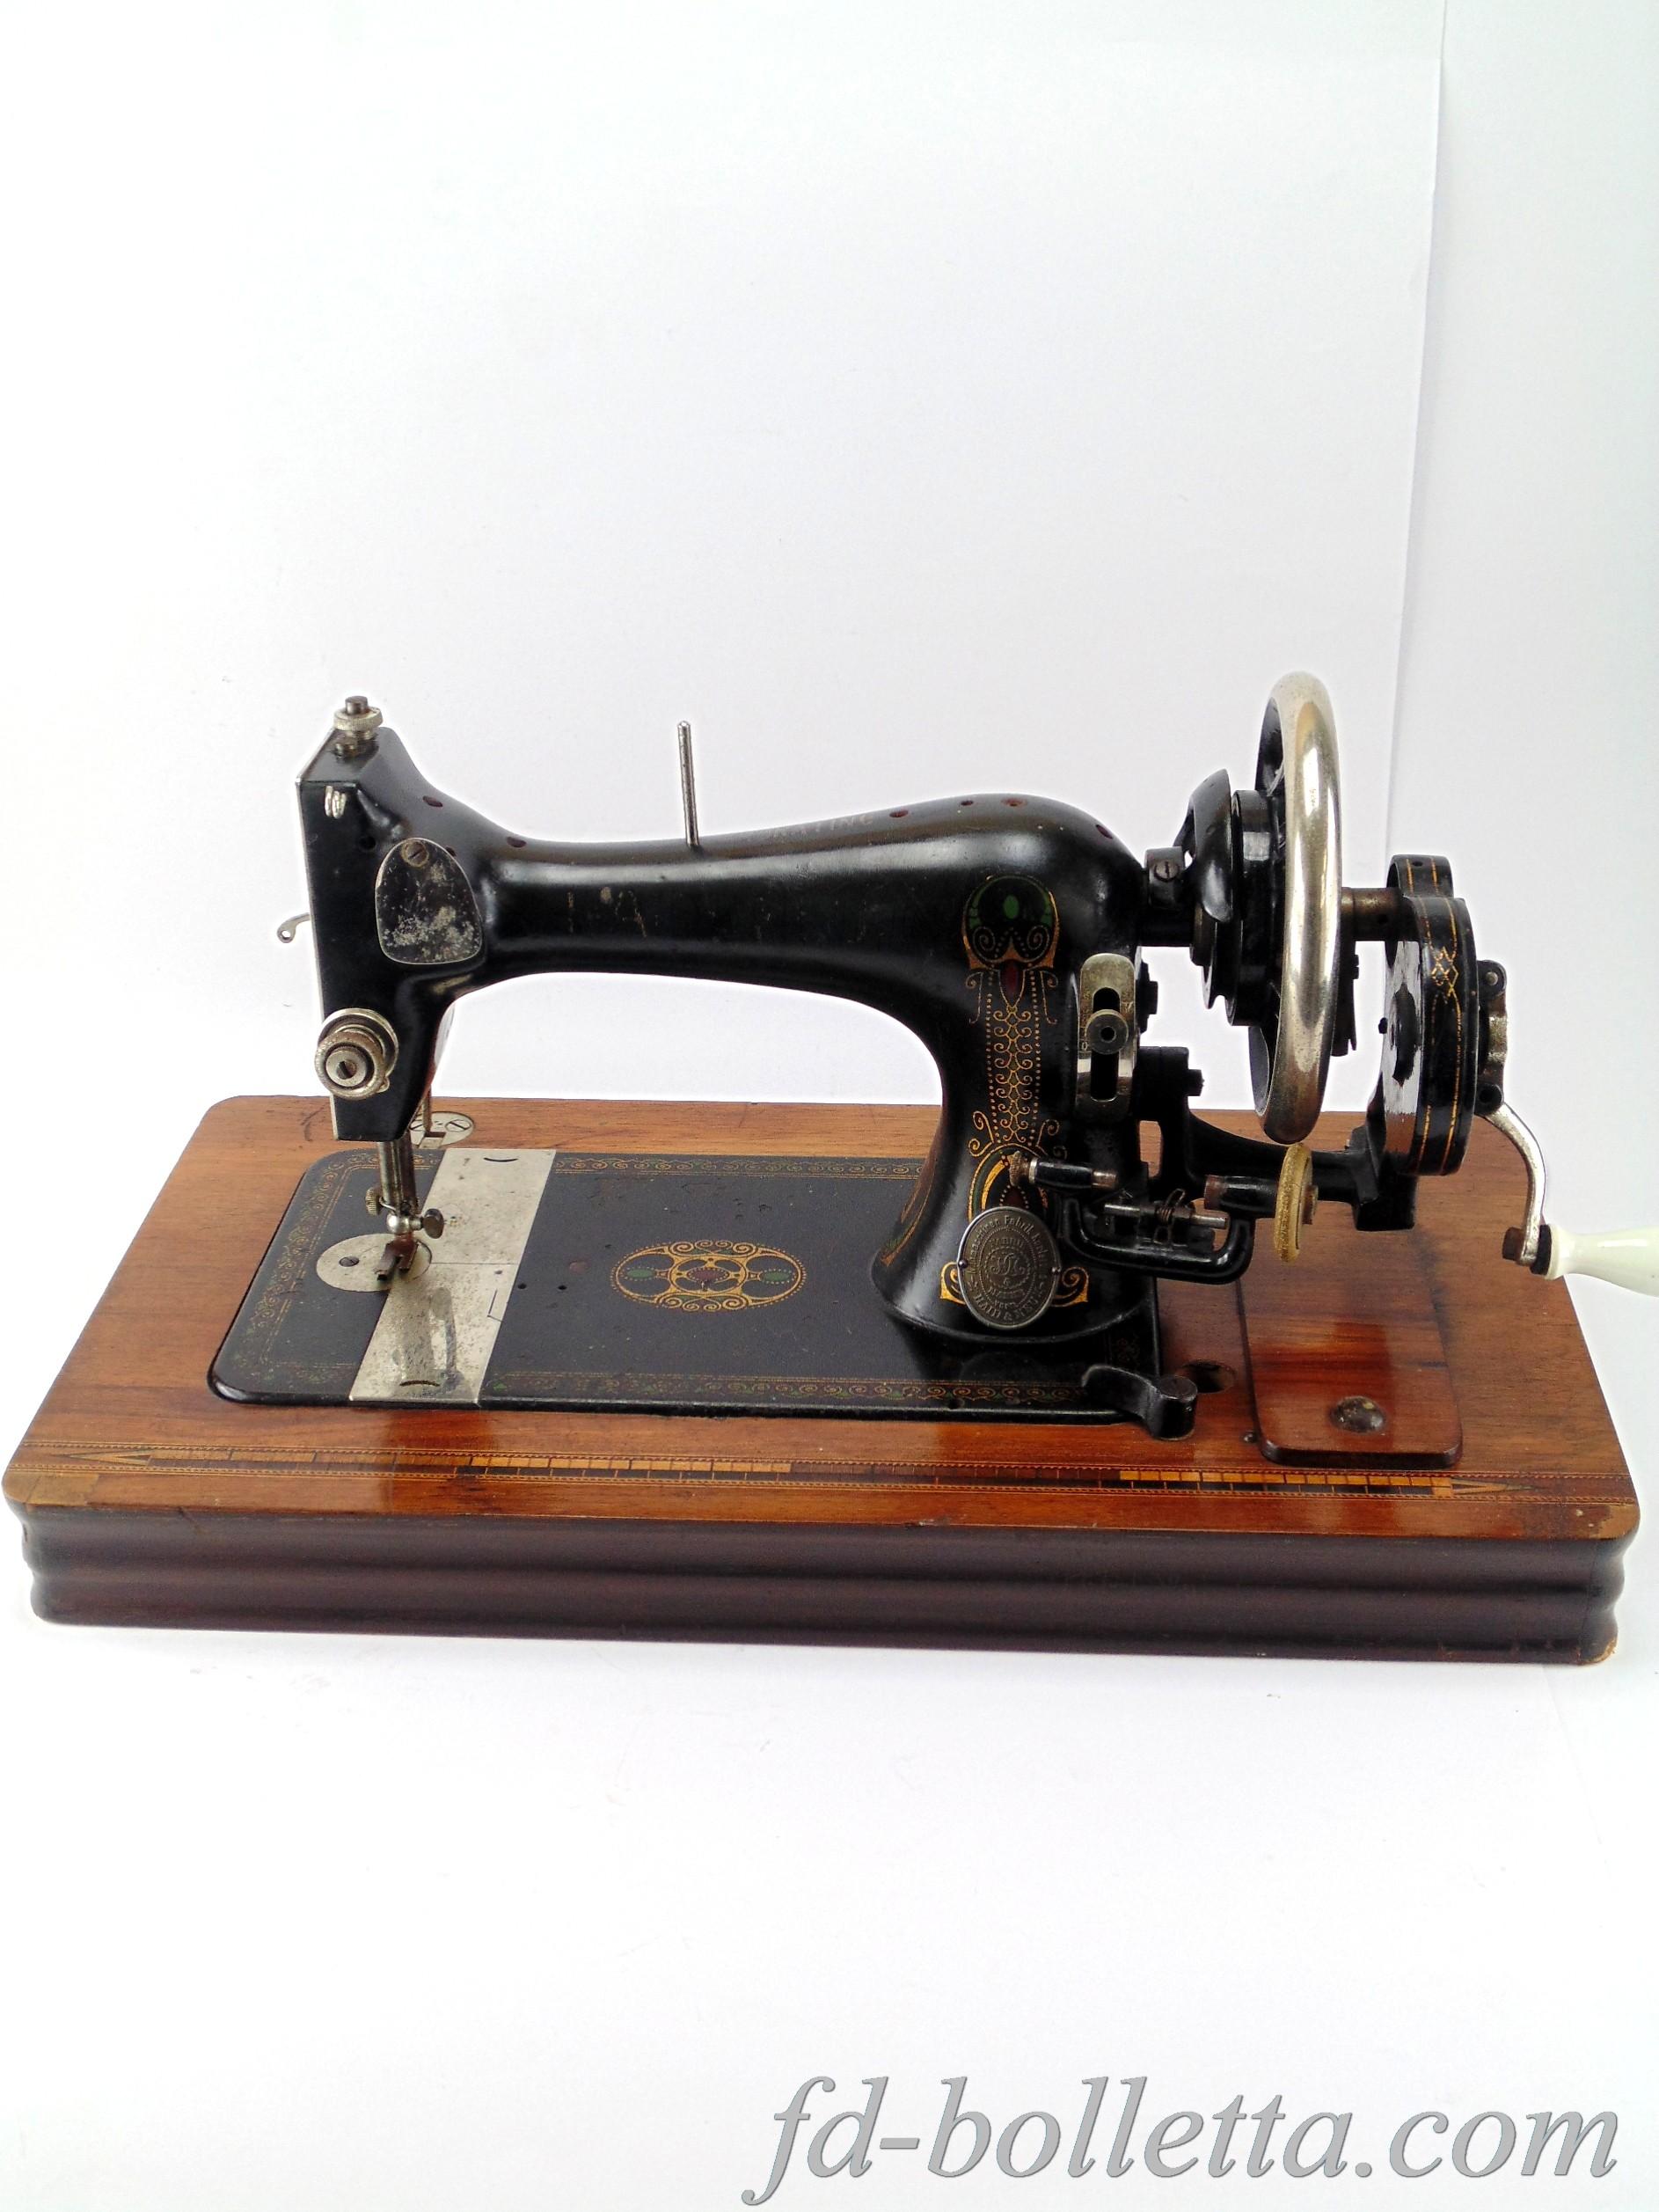 Antica macchina da cucire haid neu a643 fd bolletta for Macchina da cucire da tavolo